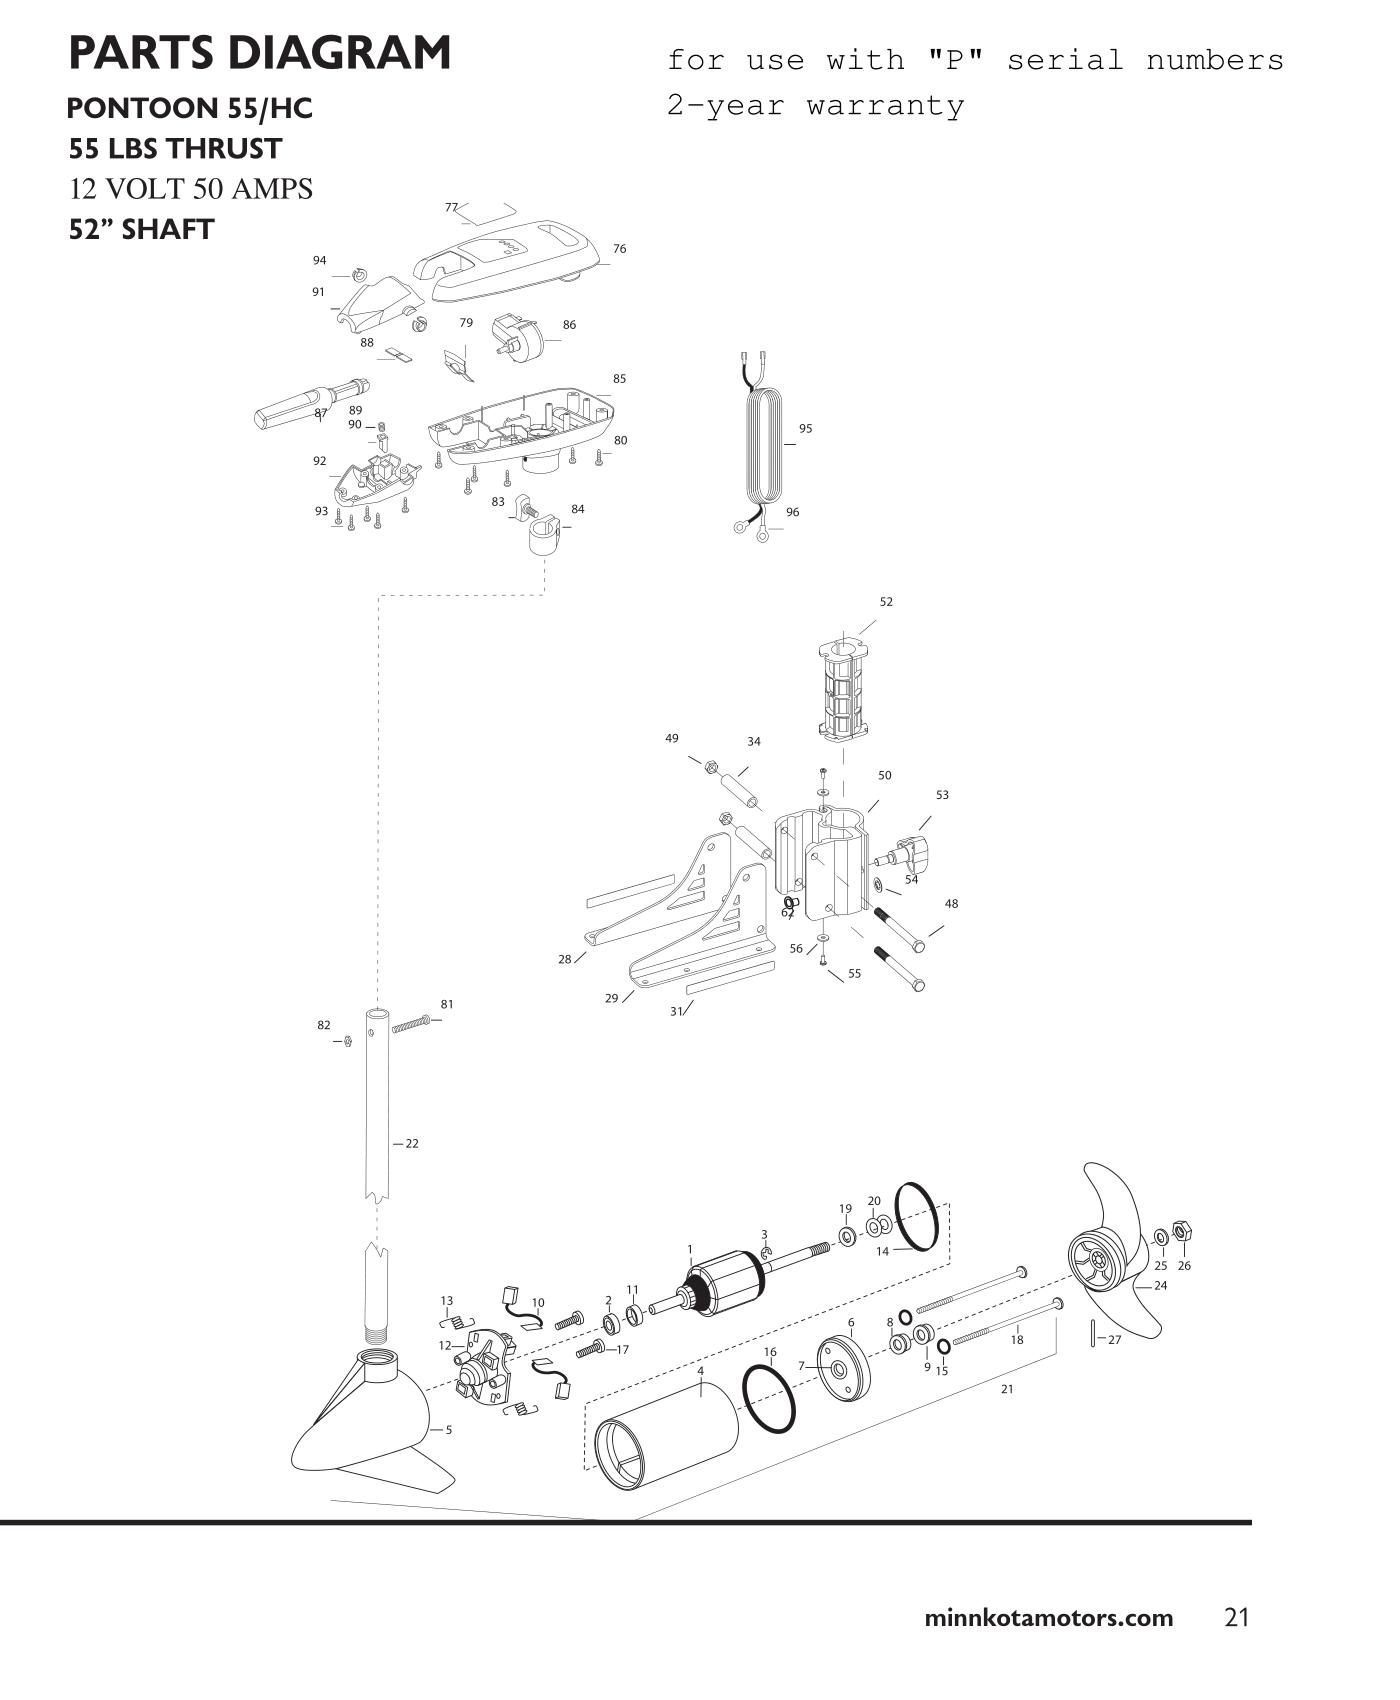 2015-mk-pontoon55handcontrol-1.png